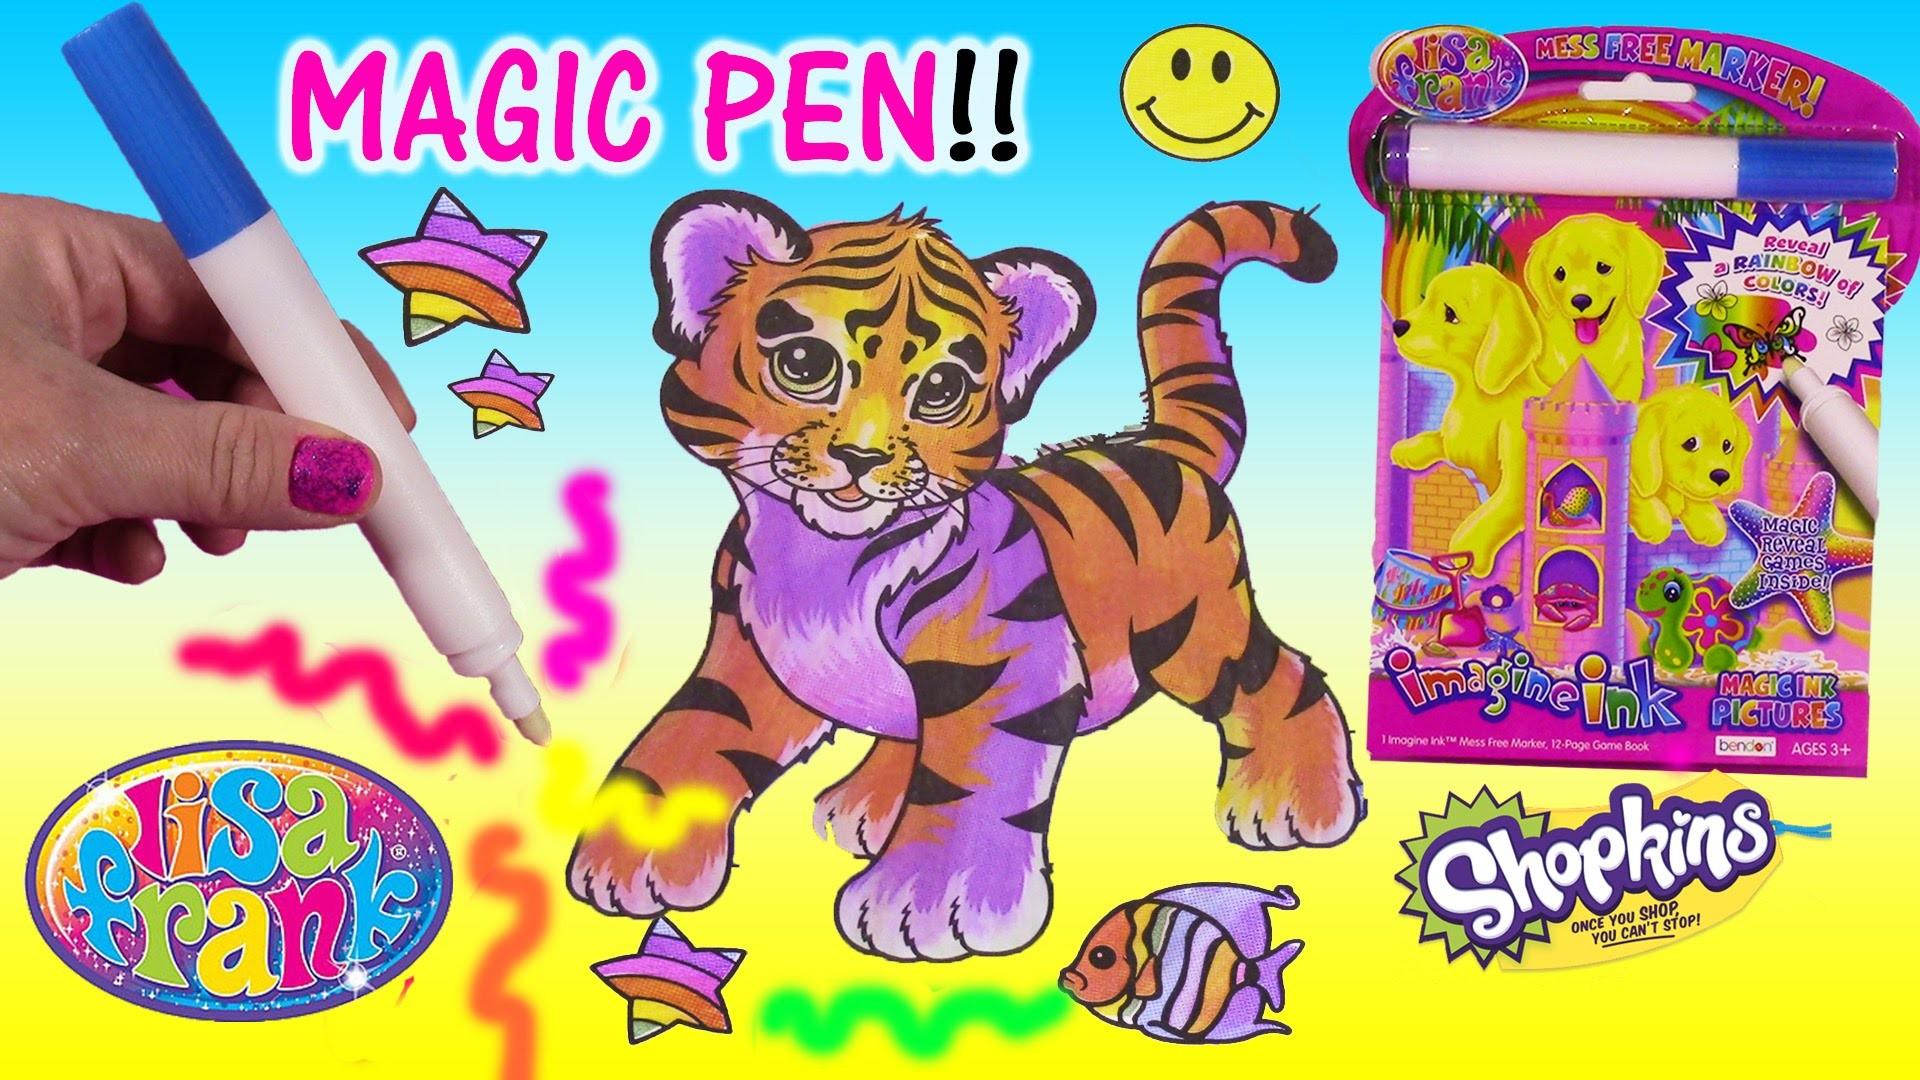 LISA FRANK Imagine Ink Rainbow Color MAGIC PEN Art Book! SHOPKINS Lip Gloss  Keychain! – YouTube